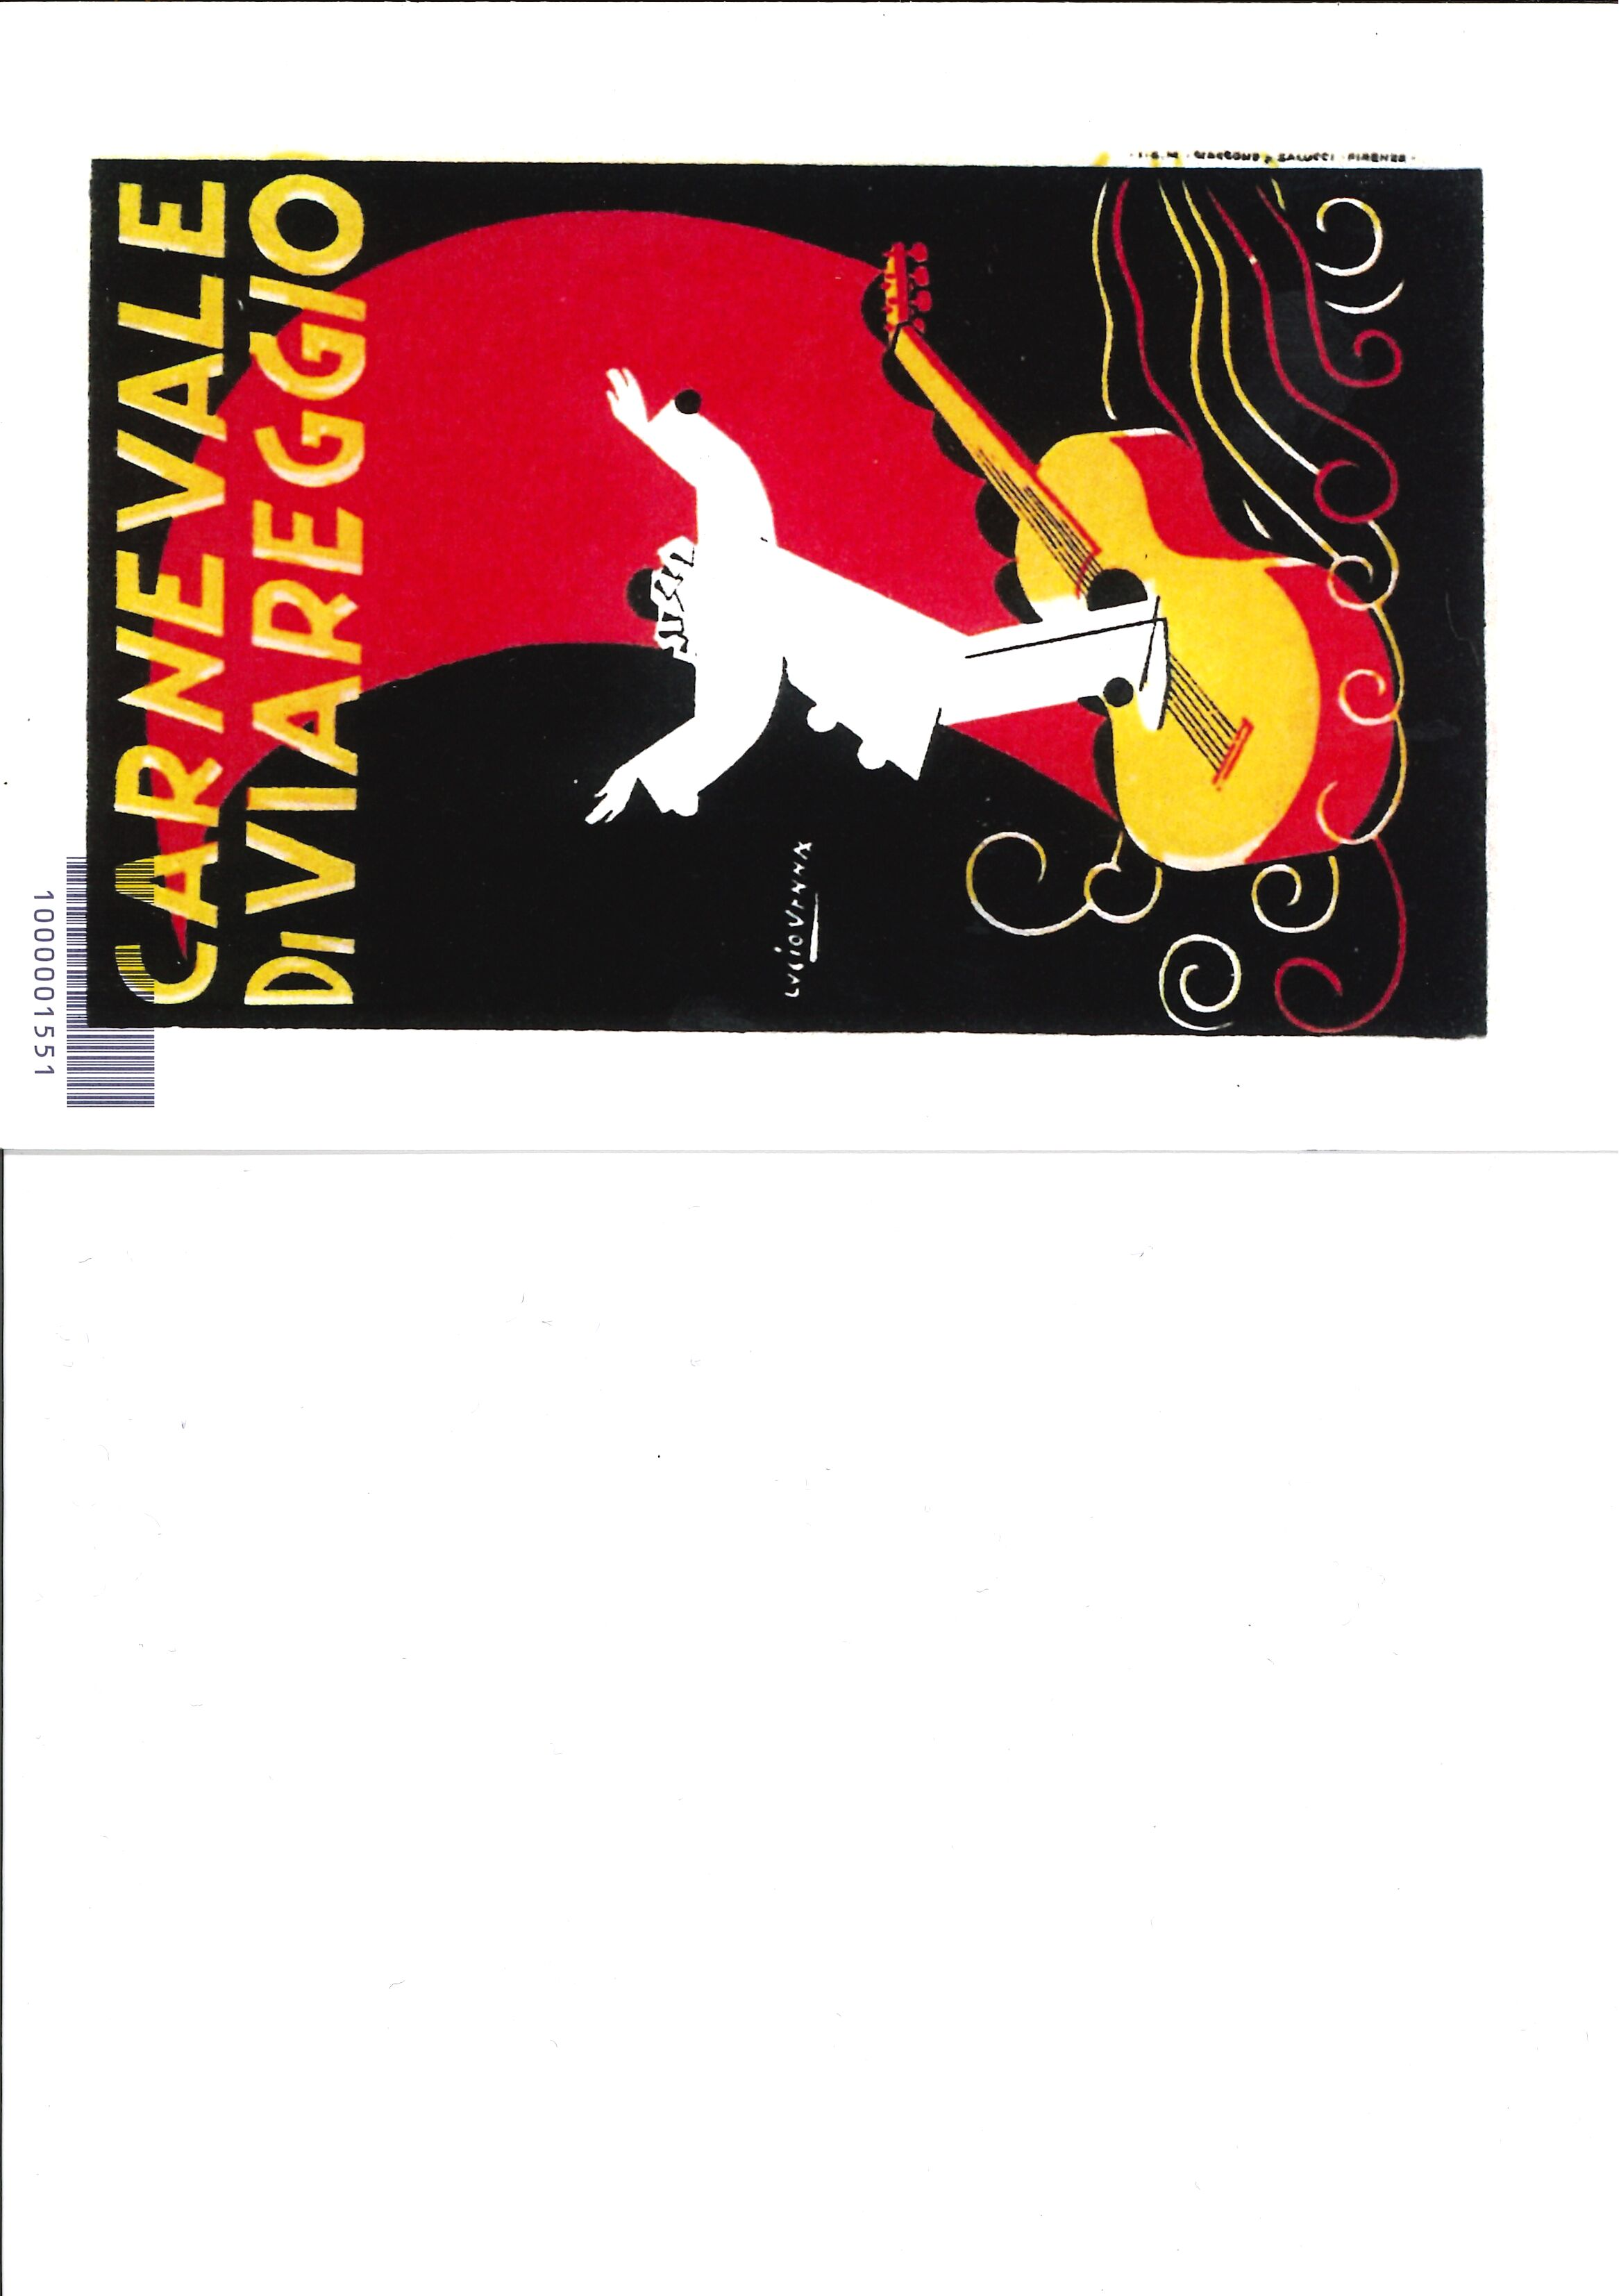 2017-02-26 Cartolina Postale 2 – retro